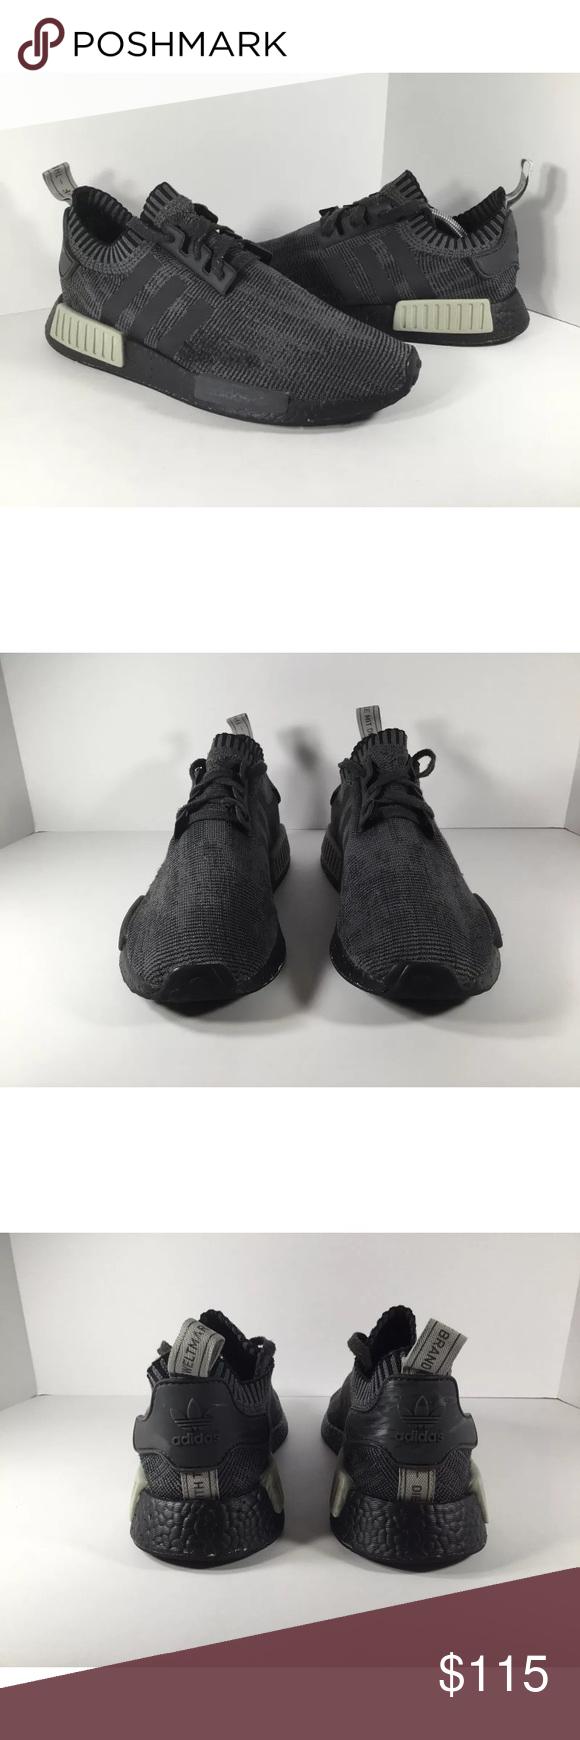 wholesale dealer 9097d 2ac64 adidas Shoes | Adidas Nmd R1 Pk Boost Nomad | Color: Black ...